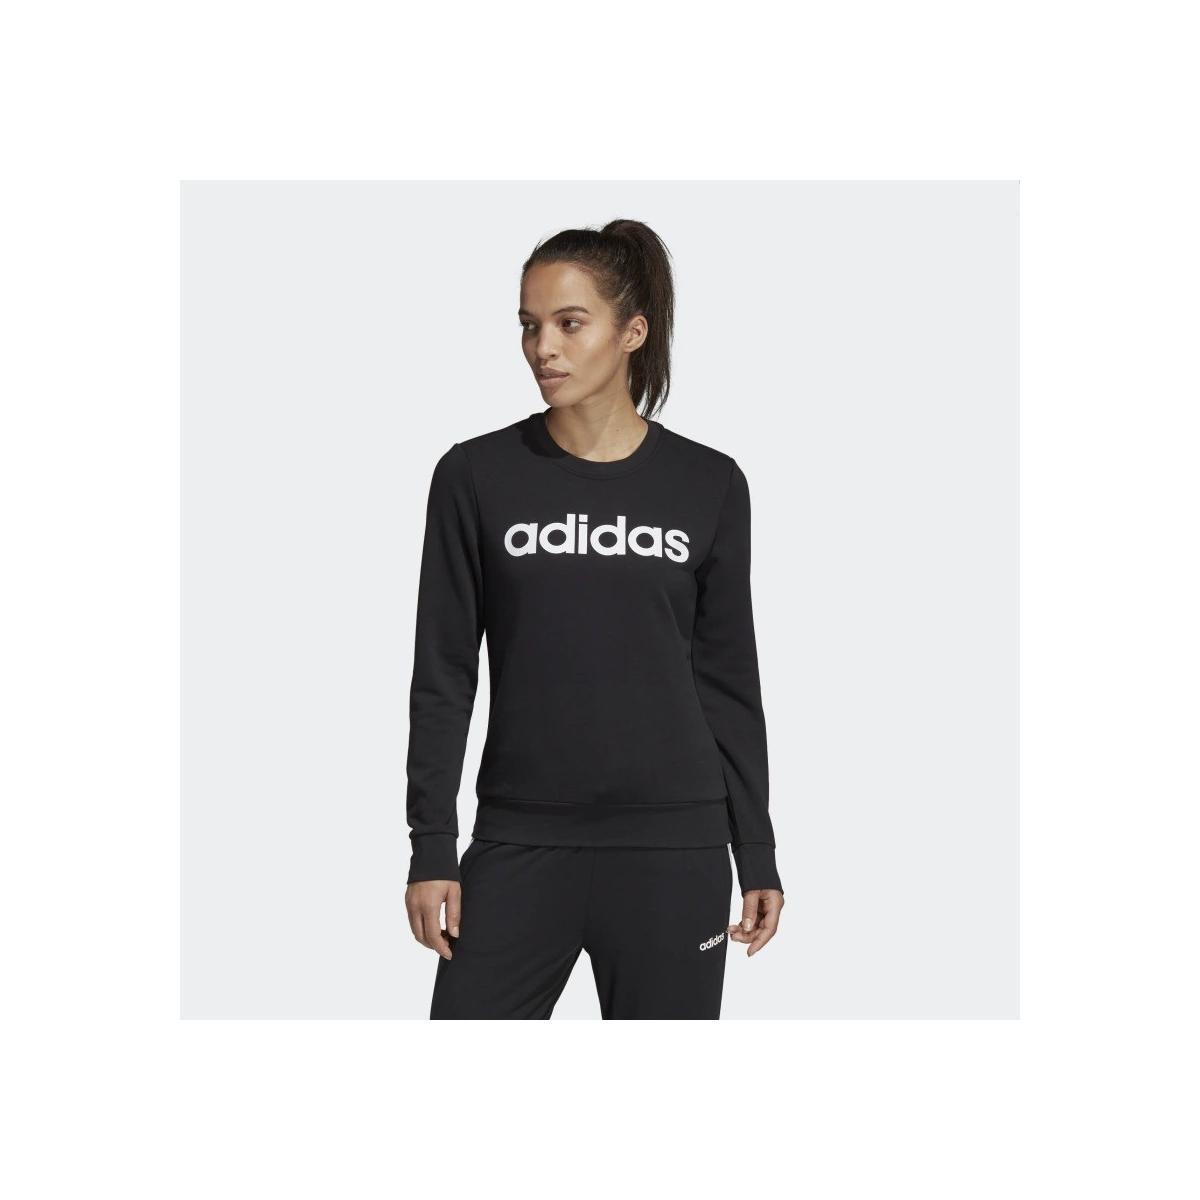 Felpa Adidas Essentials Linear girocollo con stampa da donna rif. DP2363